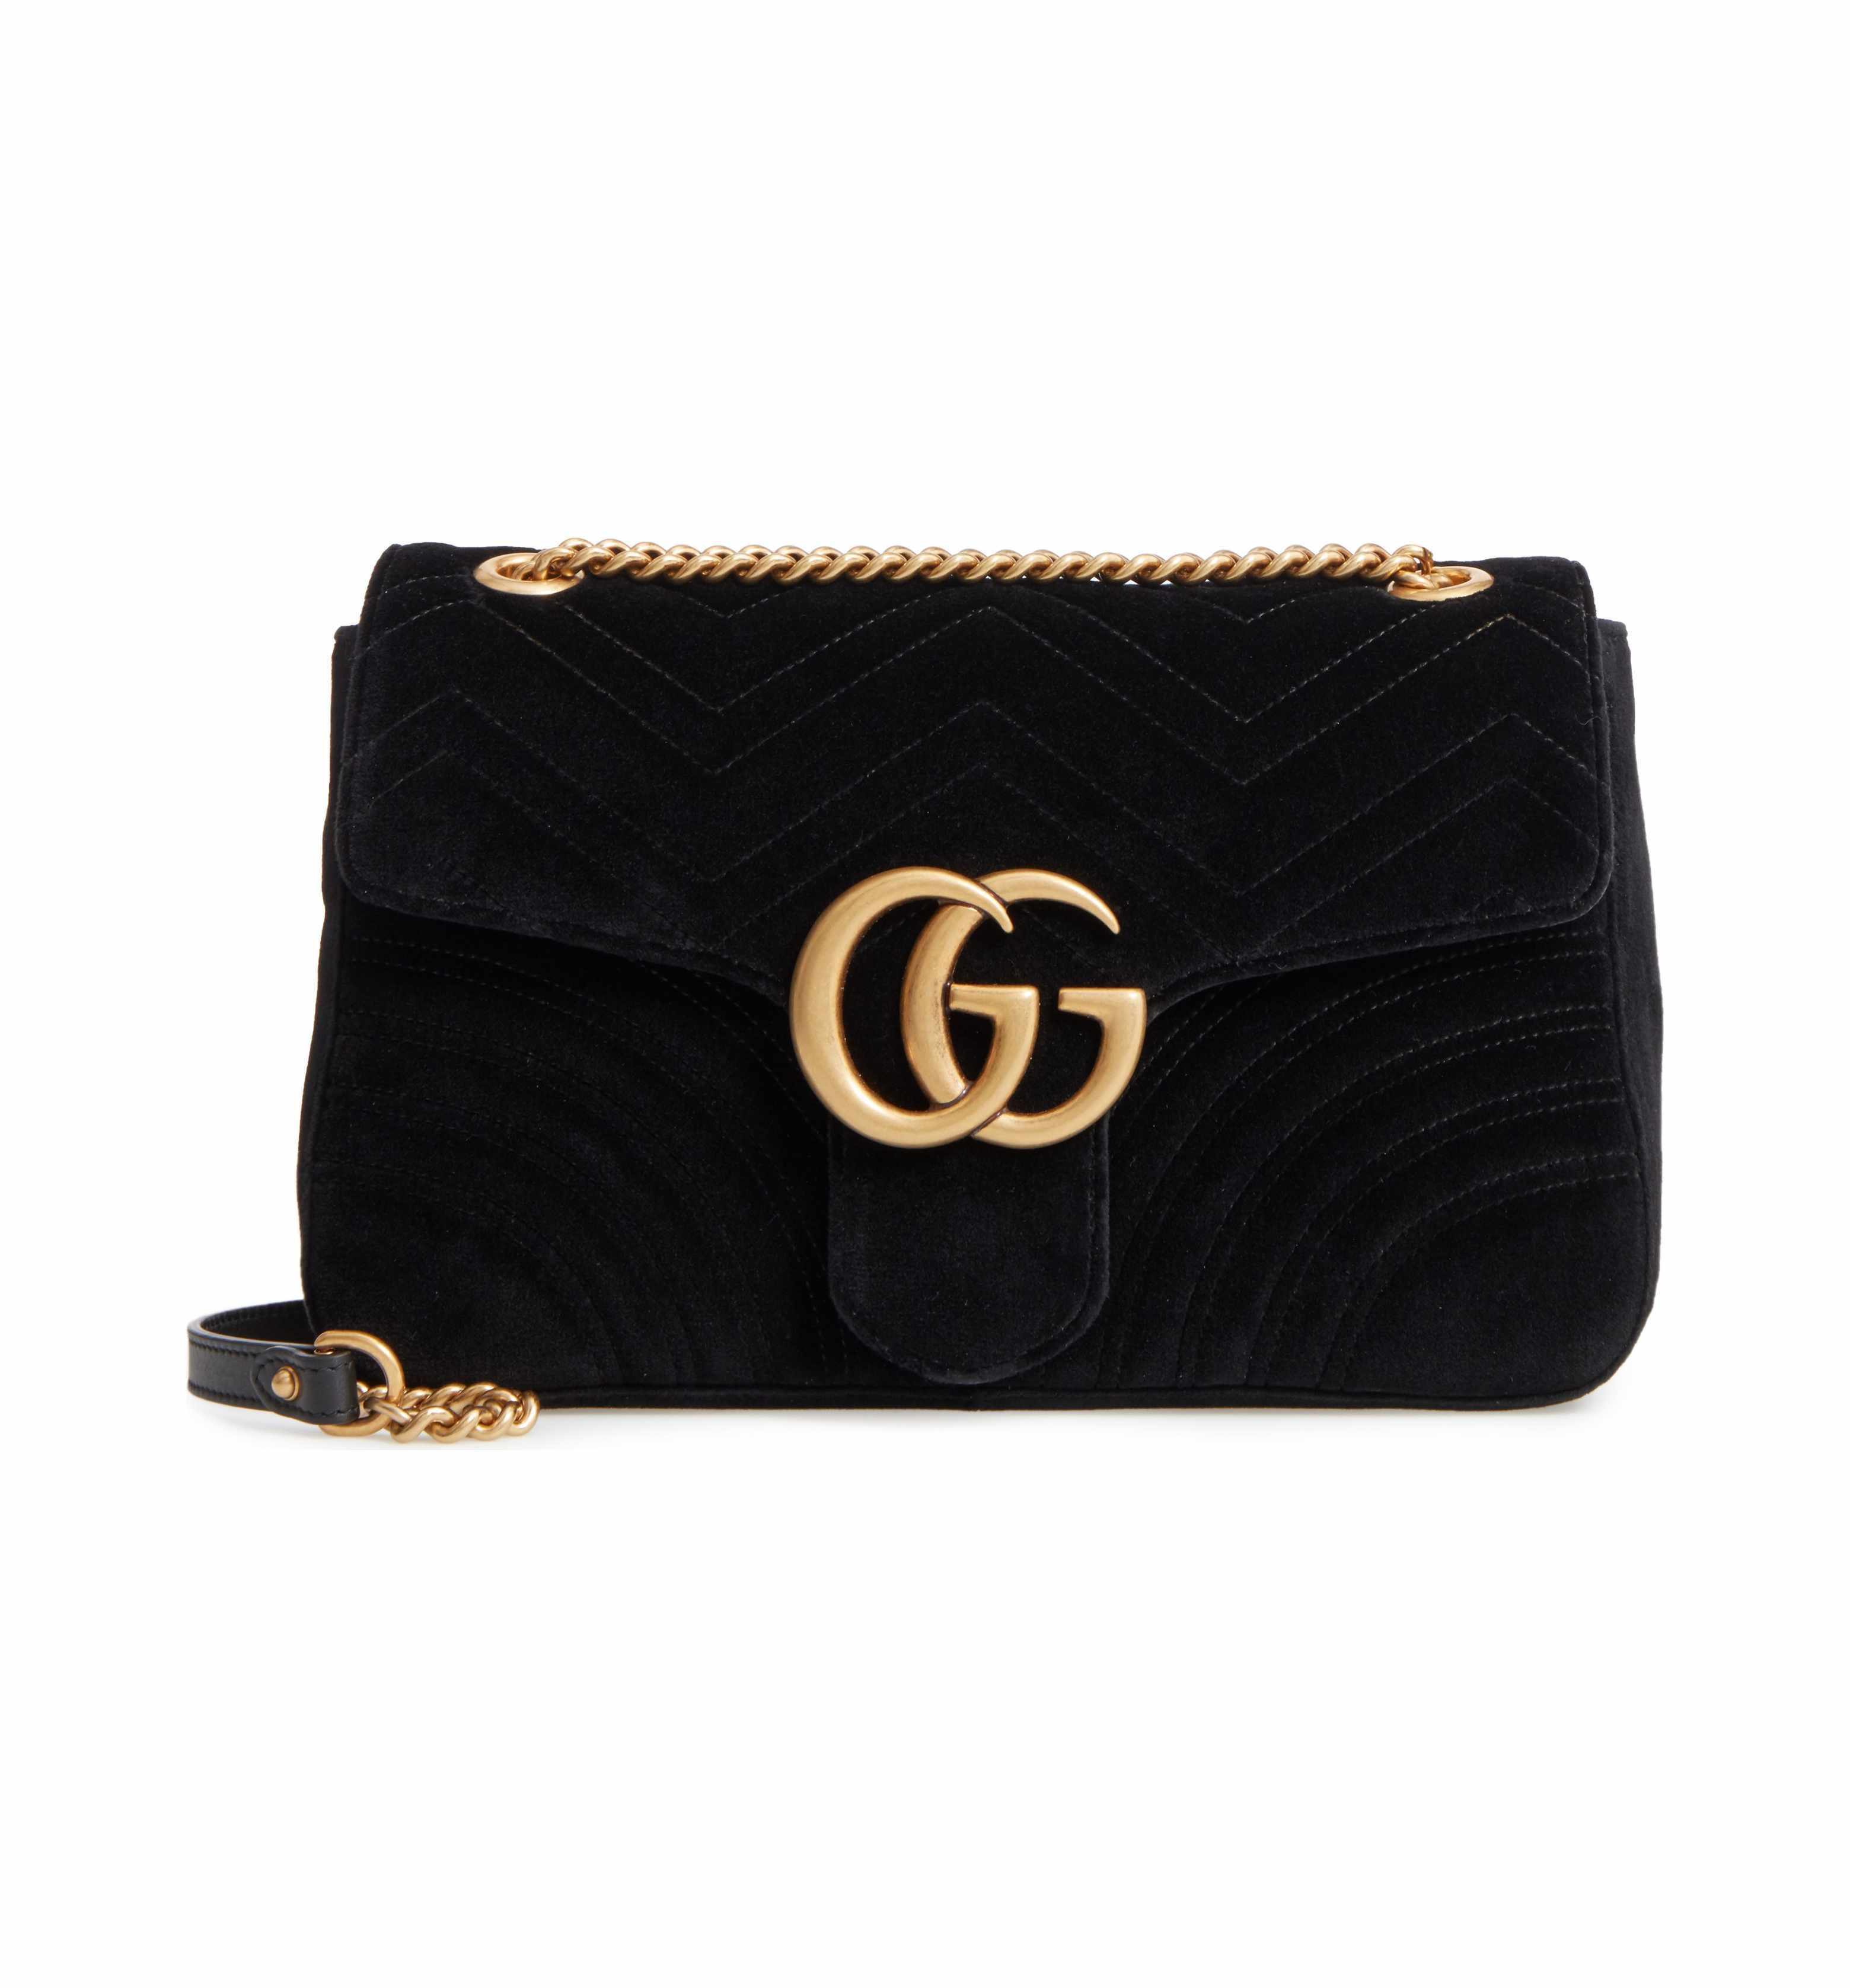 486c1da1cc6b3b Main Image - Gucci Medium GG Marmont 2.0 Matelassé Velvet Shoulder Bag